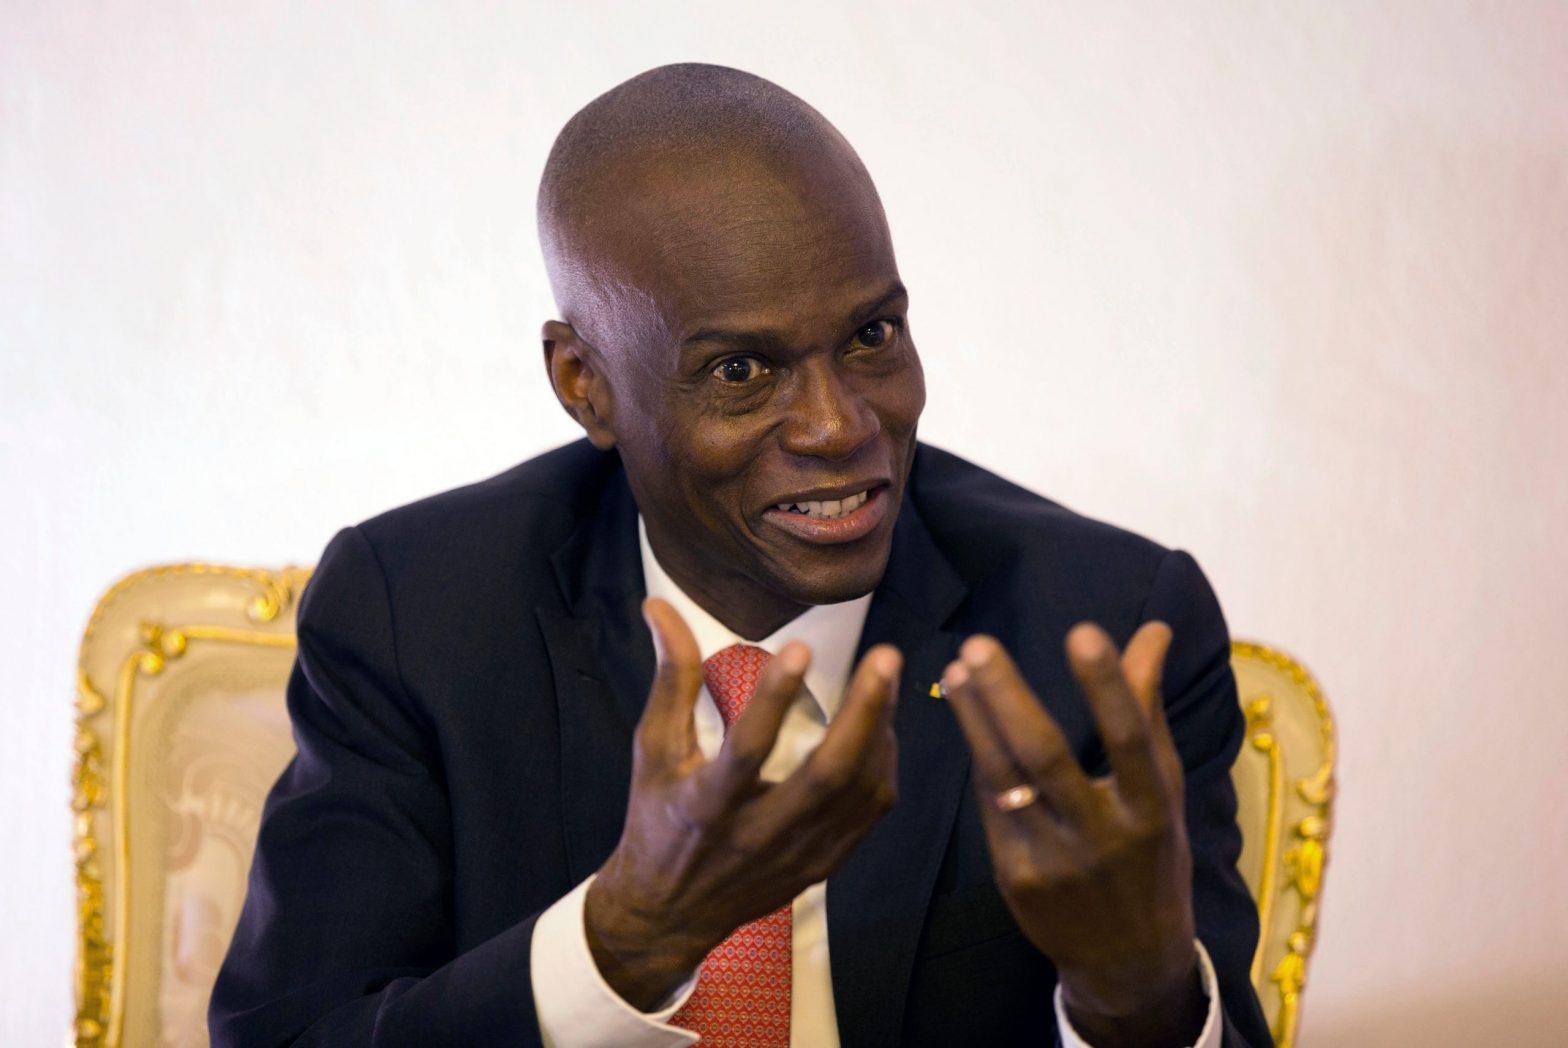 Haiti President Jovenel Moise assassinated at his home | হাইতির রাষ্ট্রপতি জোভেনেল মোইসকে দুষ্কৃতীরা তার বাড়িতেই হত্যা করে_40.1